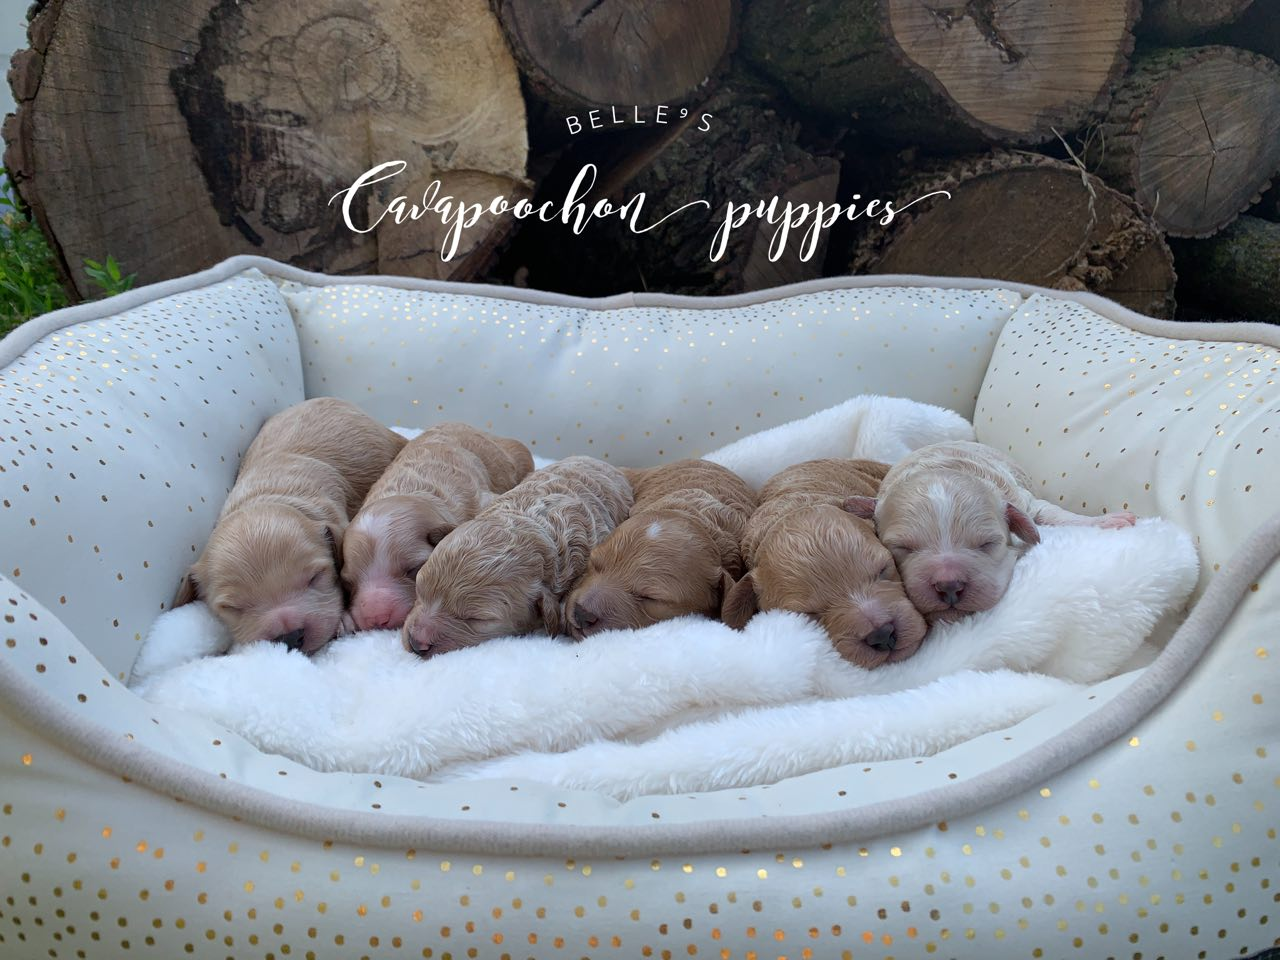 Belle's Cavapoochon puppies - 6 days old